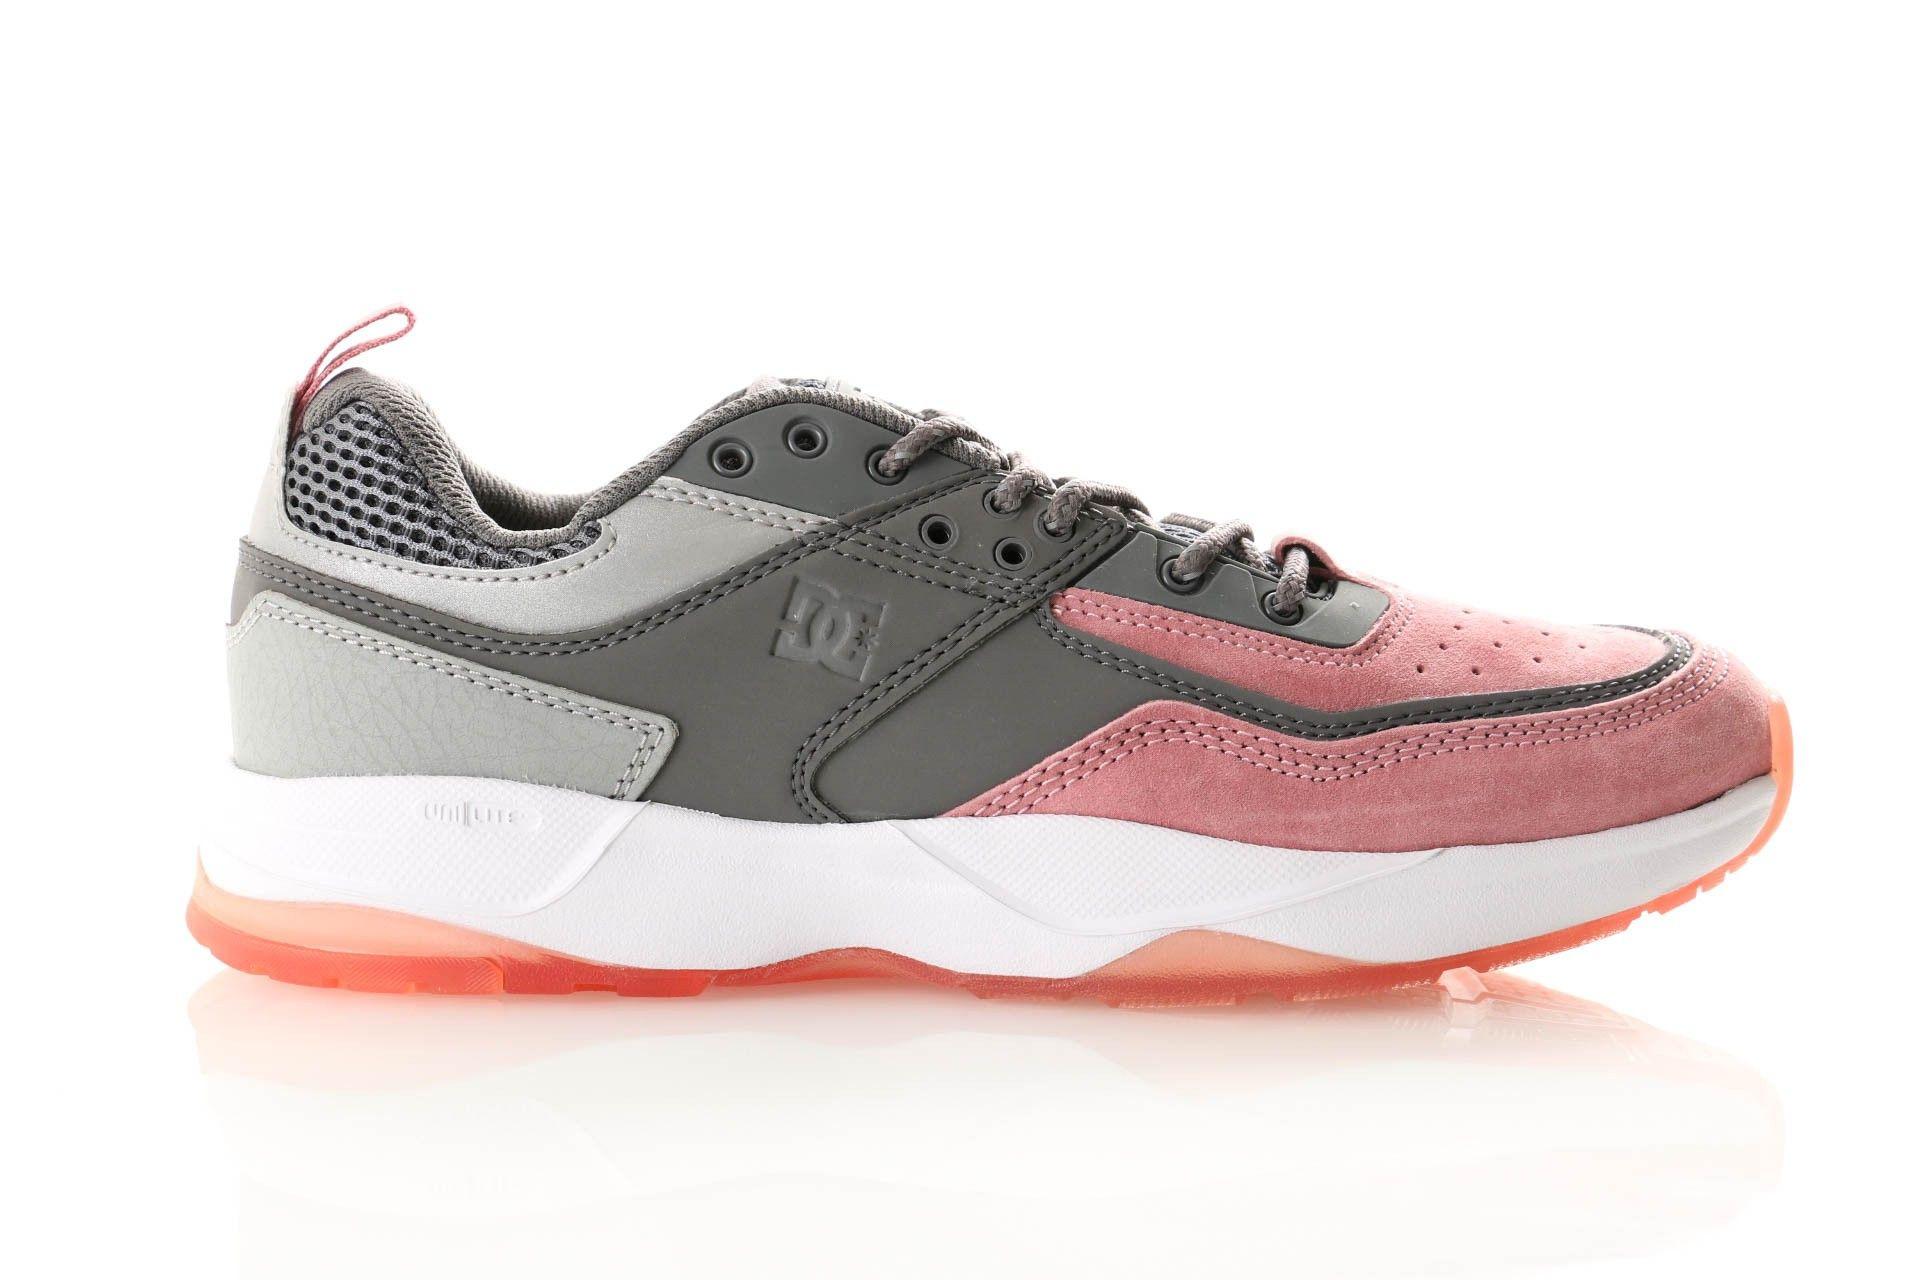 Afbeelding van Dc E.Tribeka Se M Shoe Xssr Adys700142 Sneakers Grey/Grey/Red